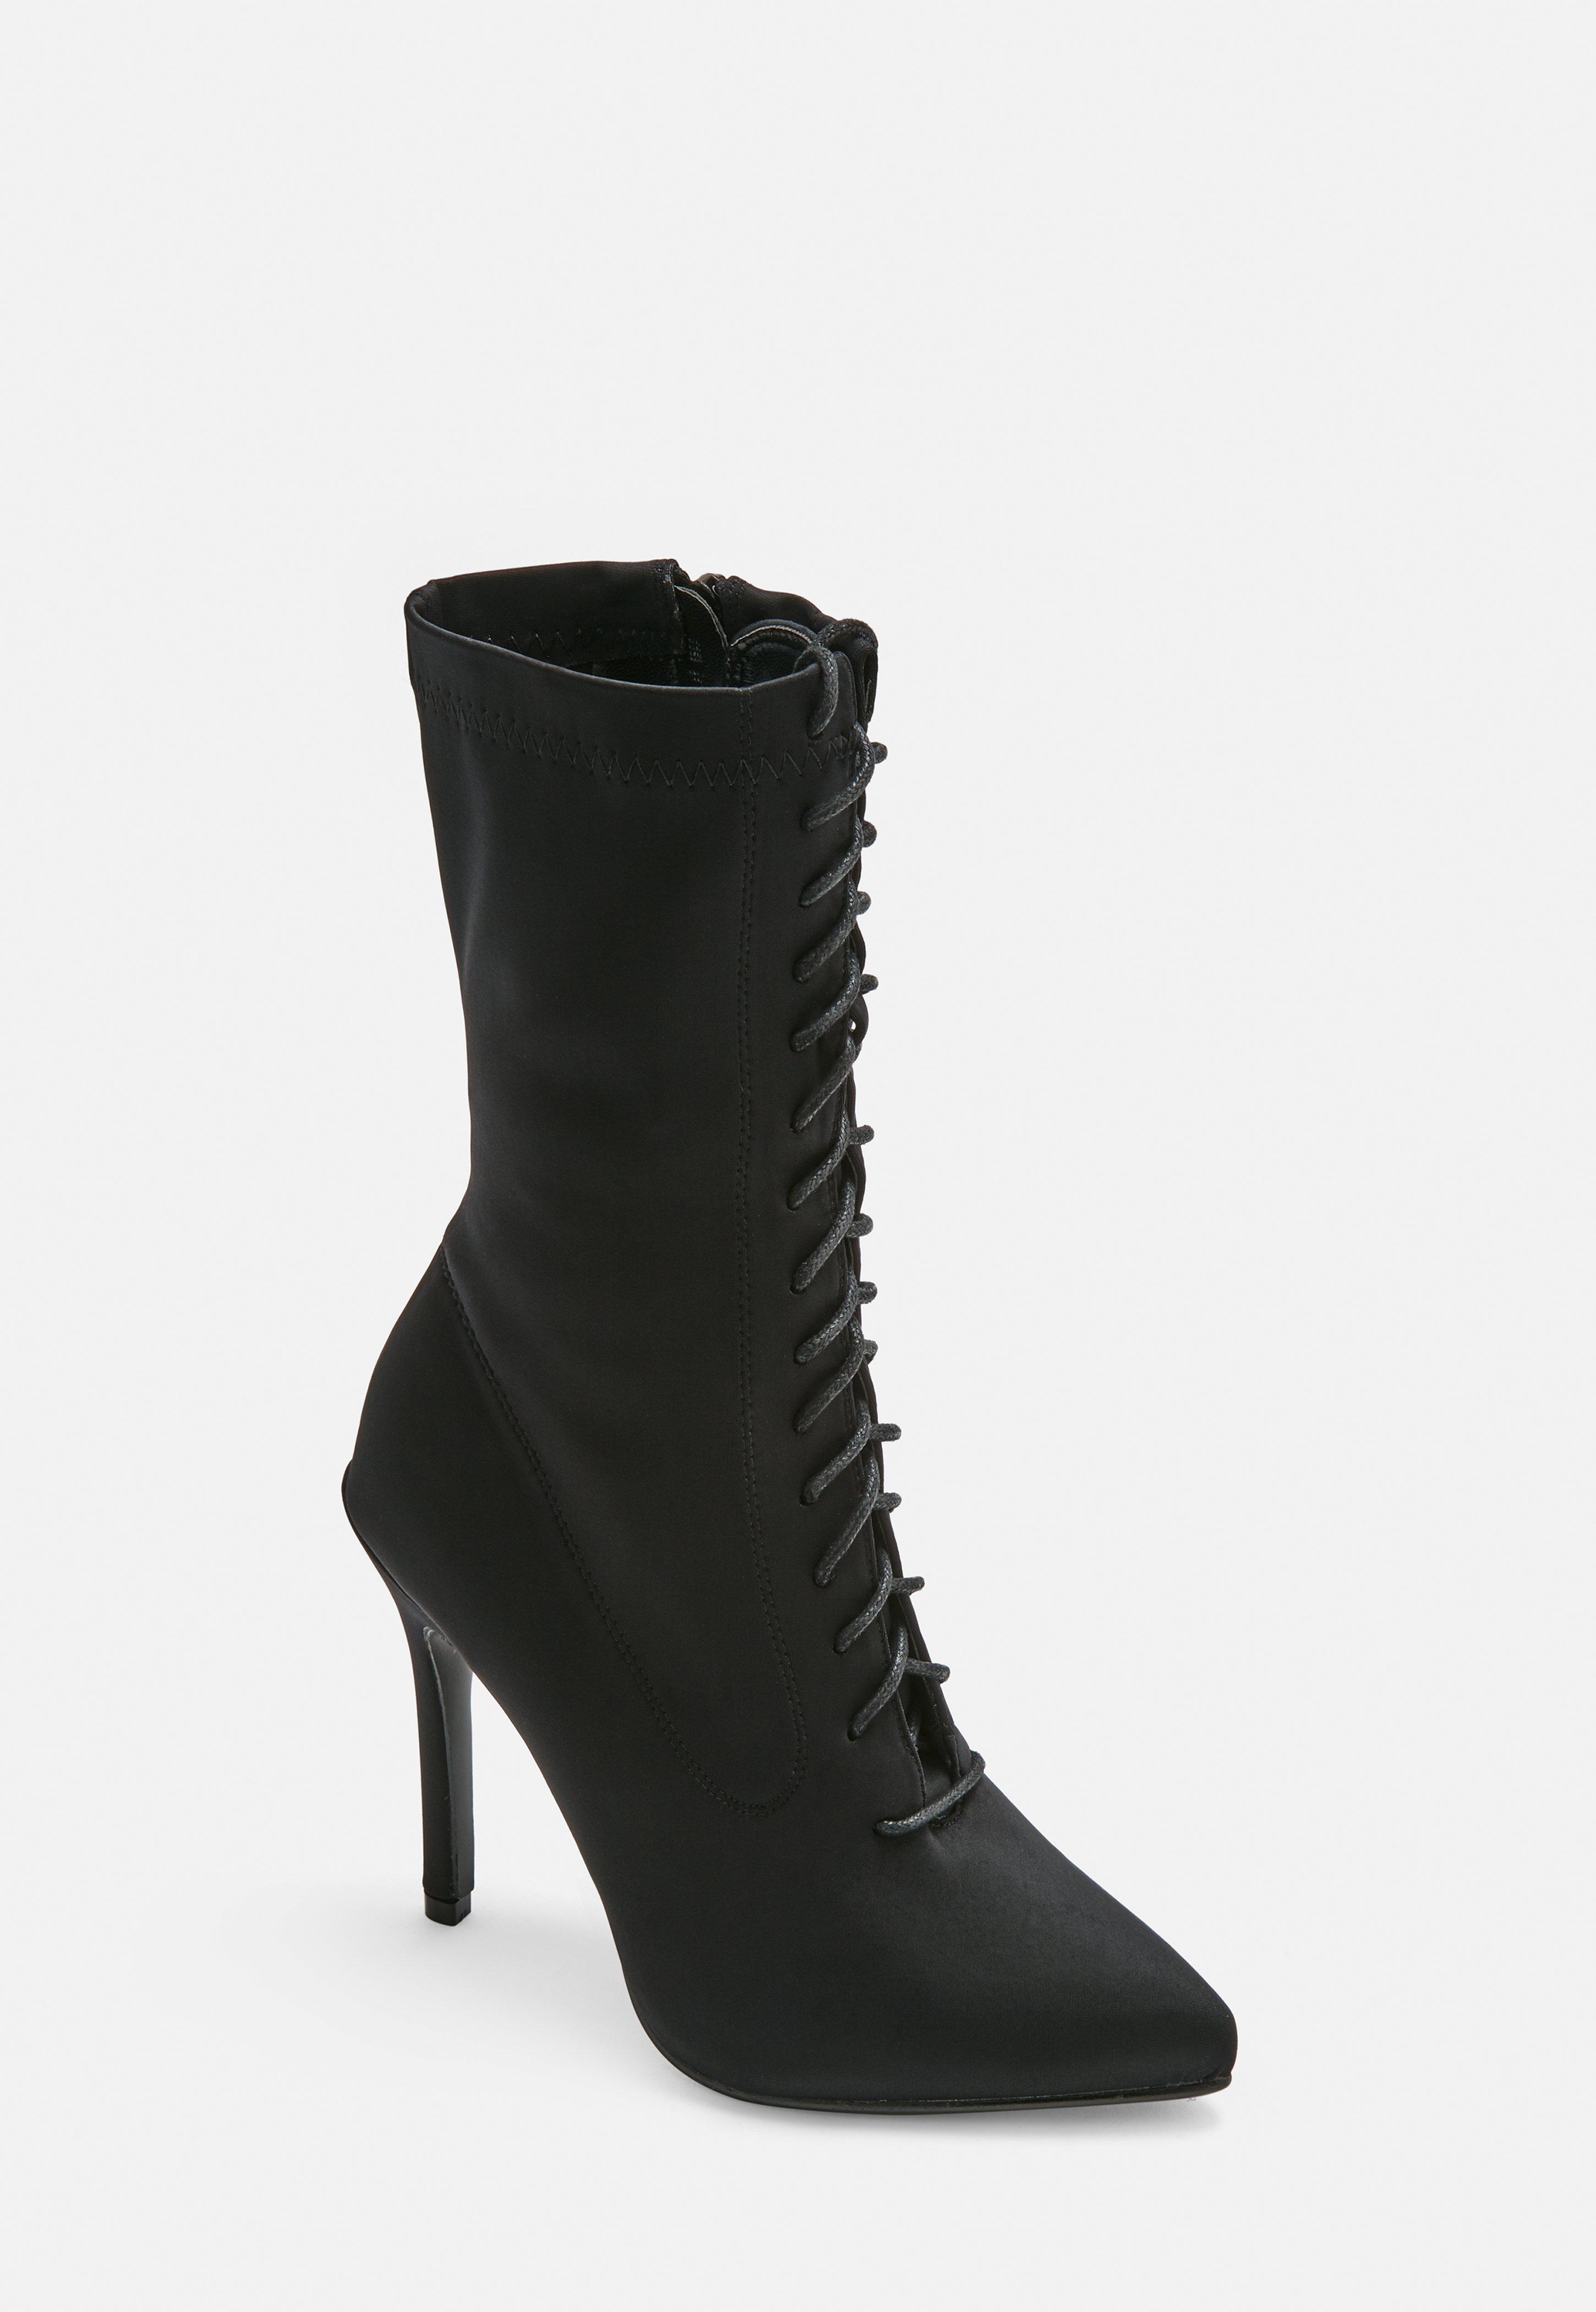 48c9e77f6052 Black Heels